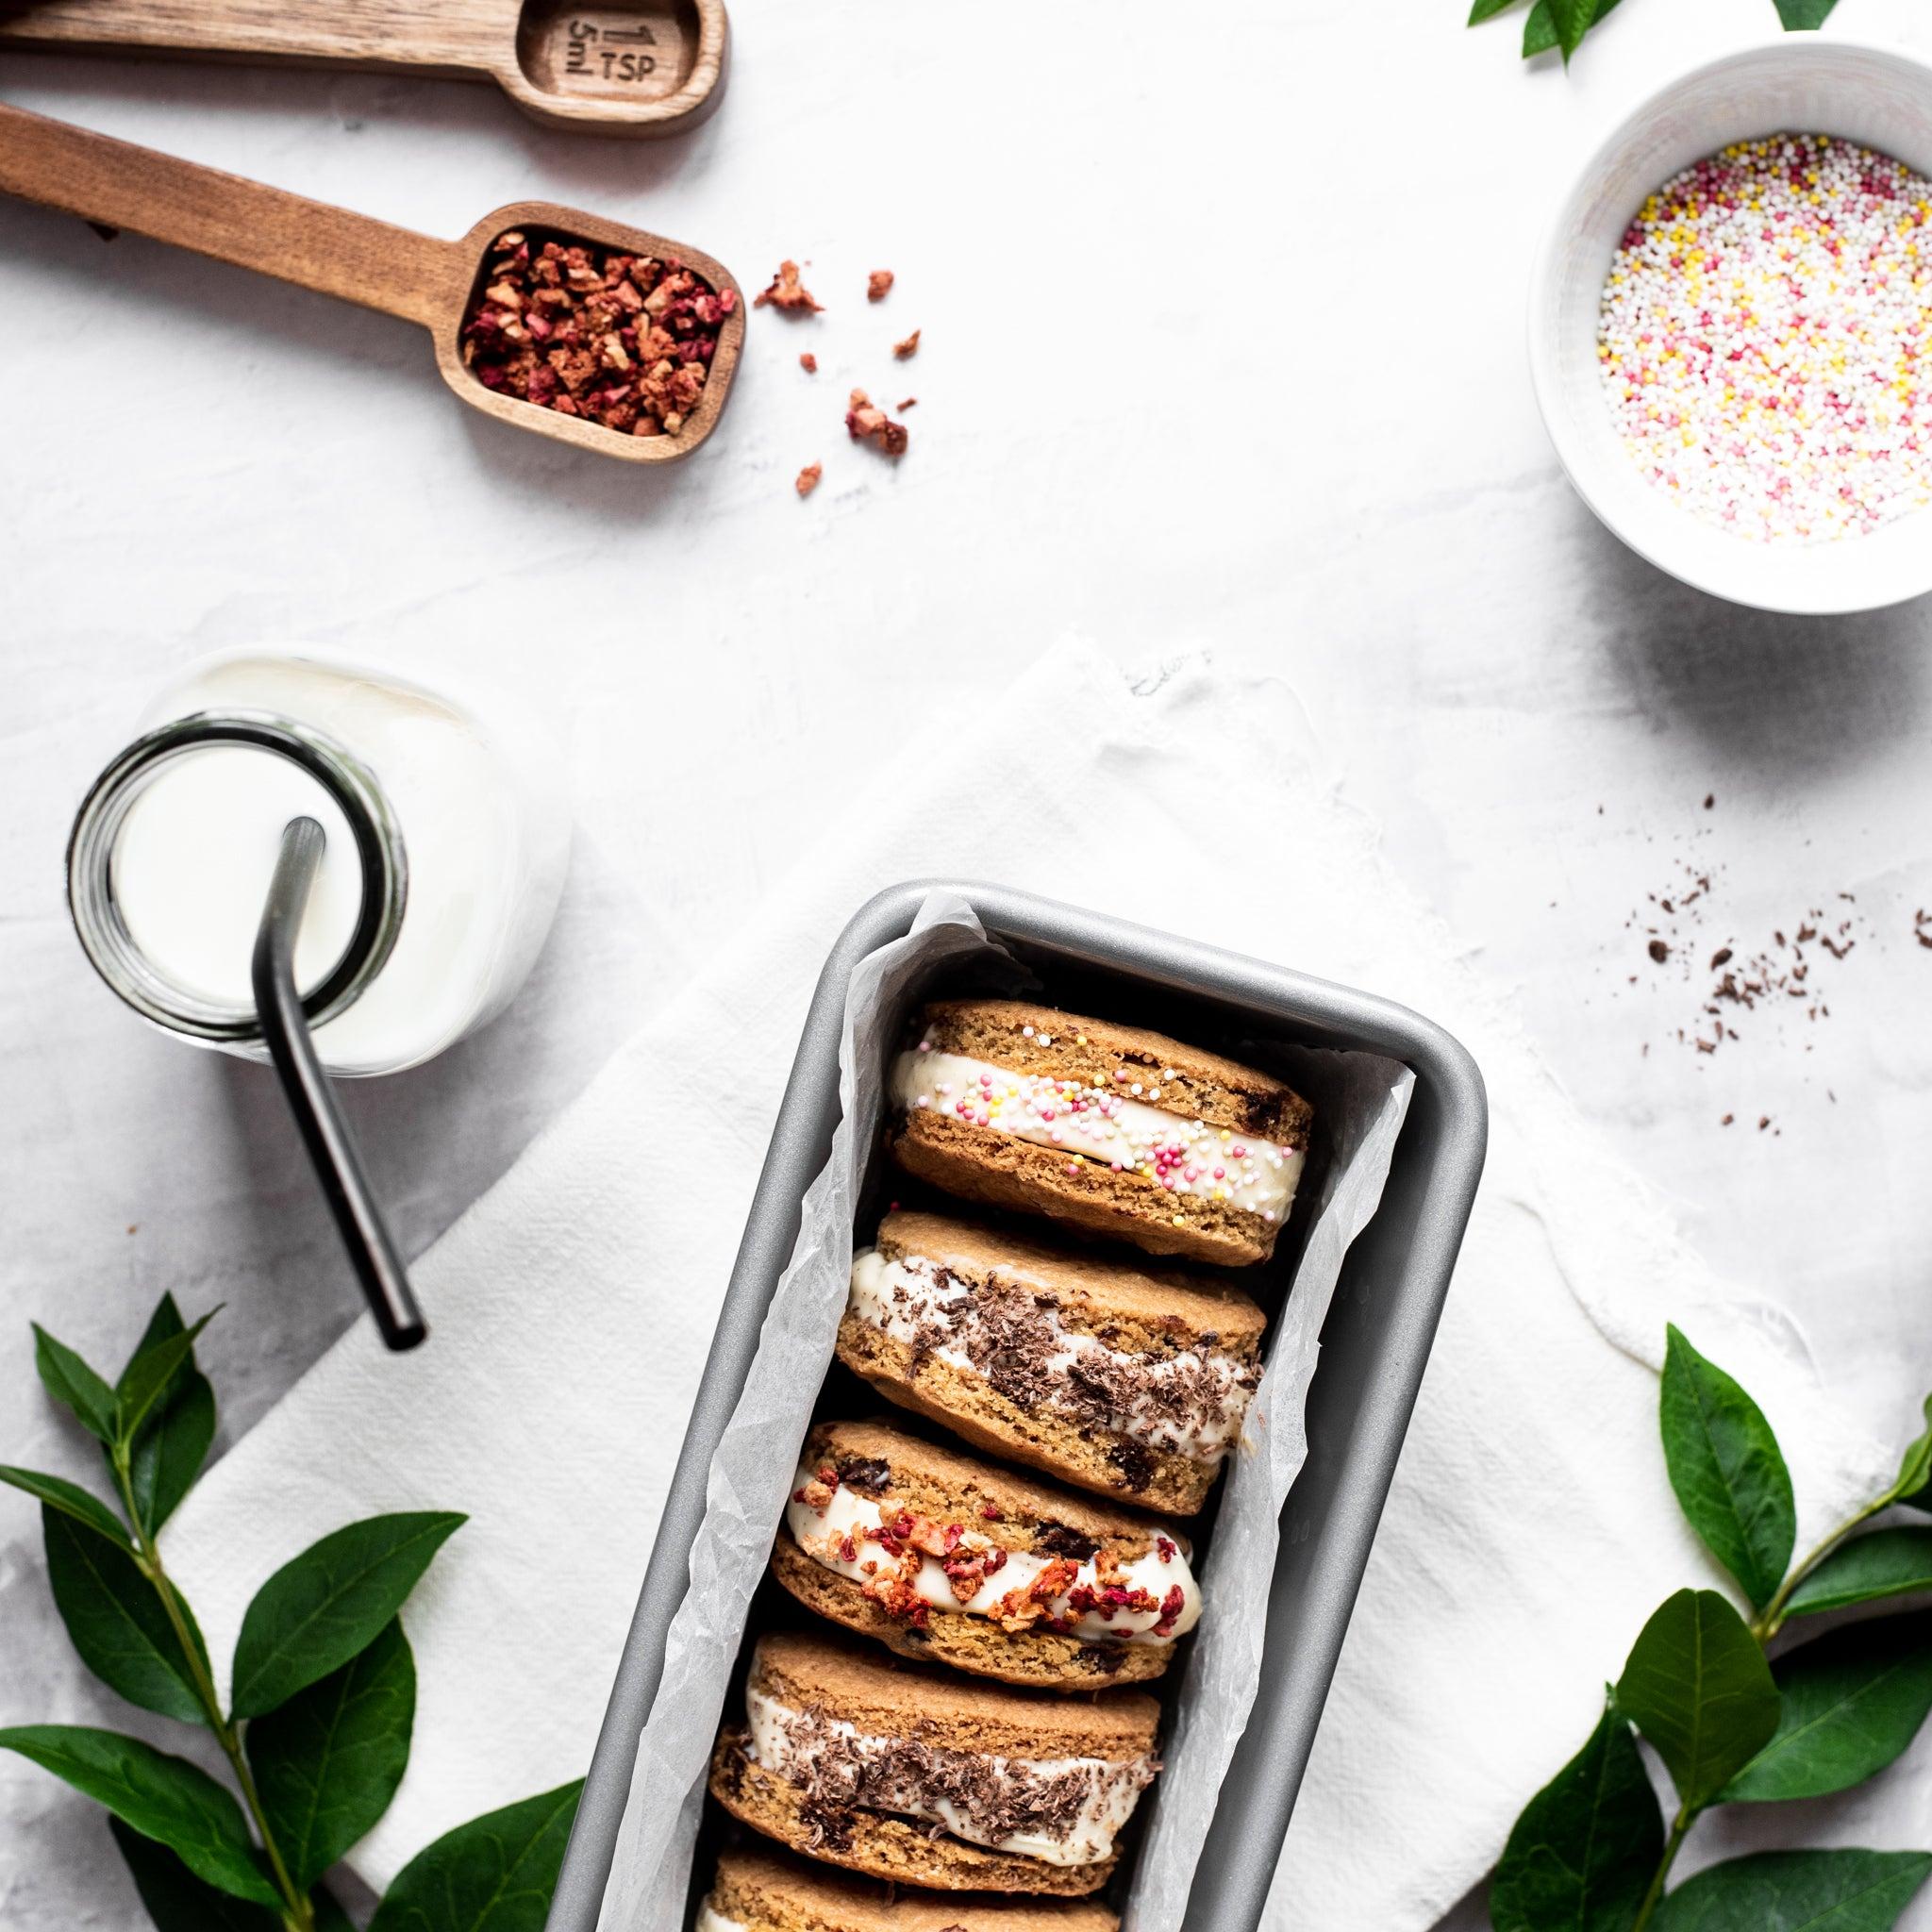 Ice-Cream-Sandwich-SQUARE-5.jpg